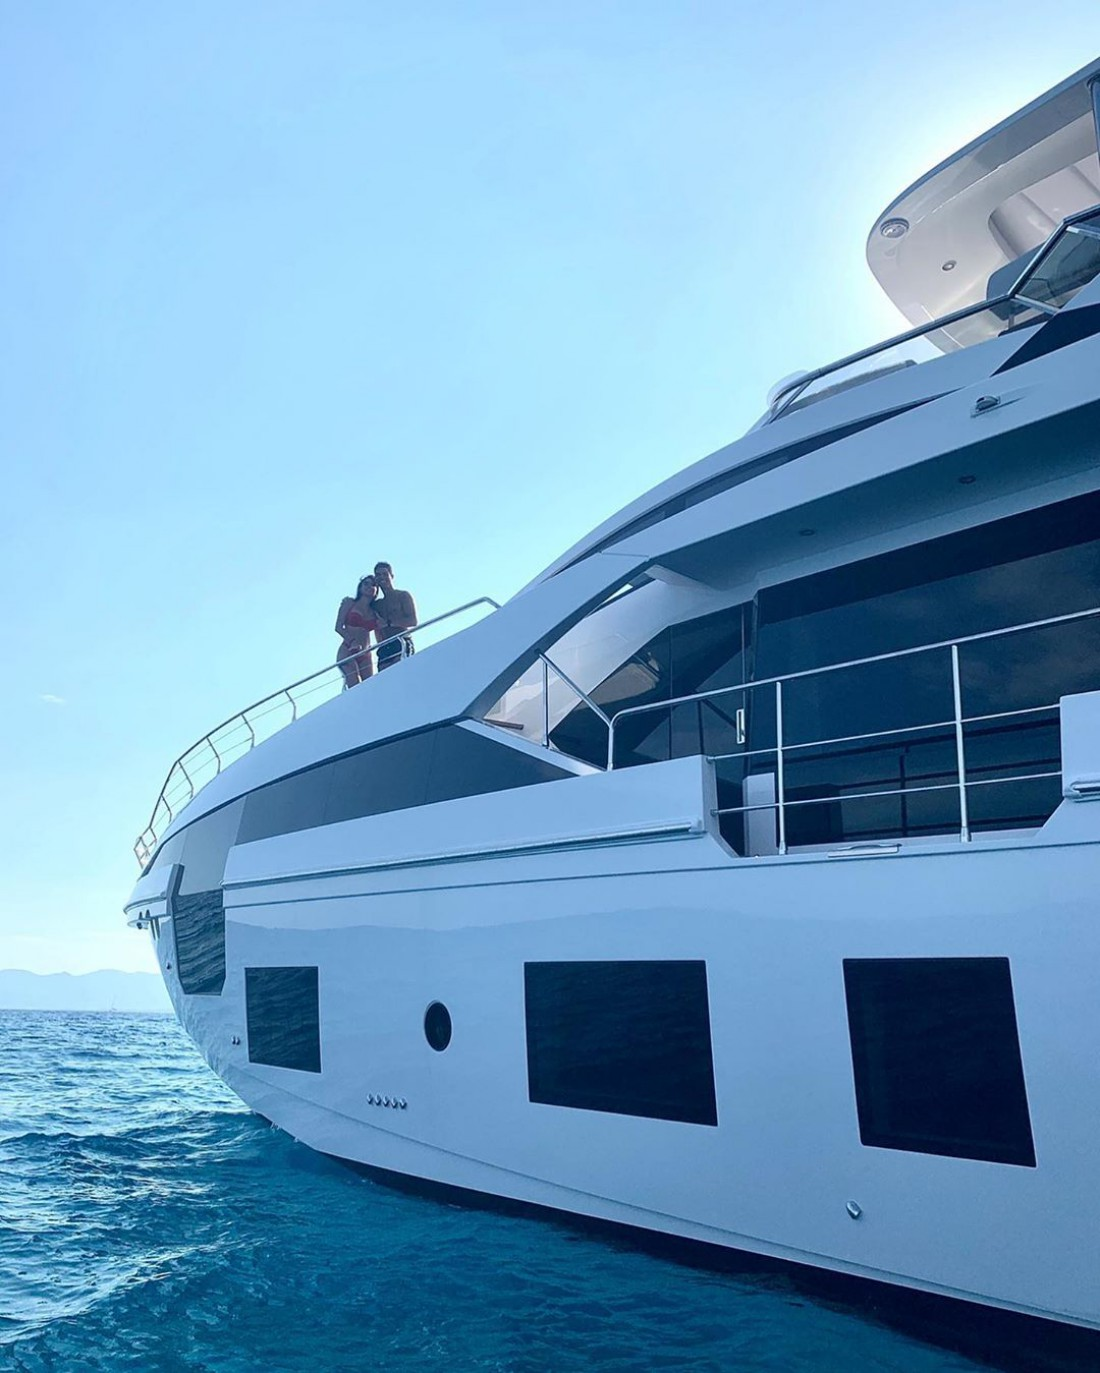 Криштиану Роналду купил яхту